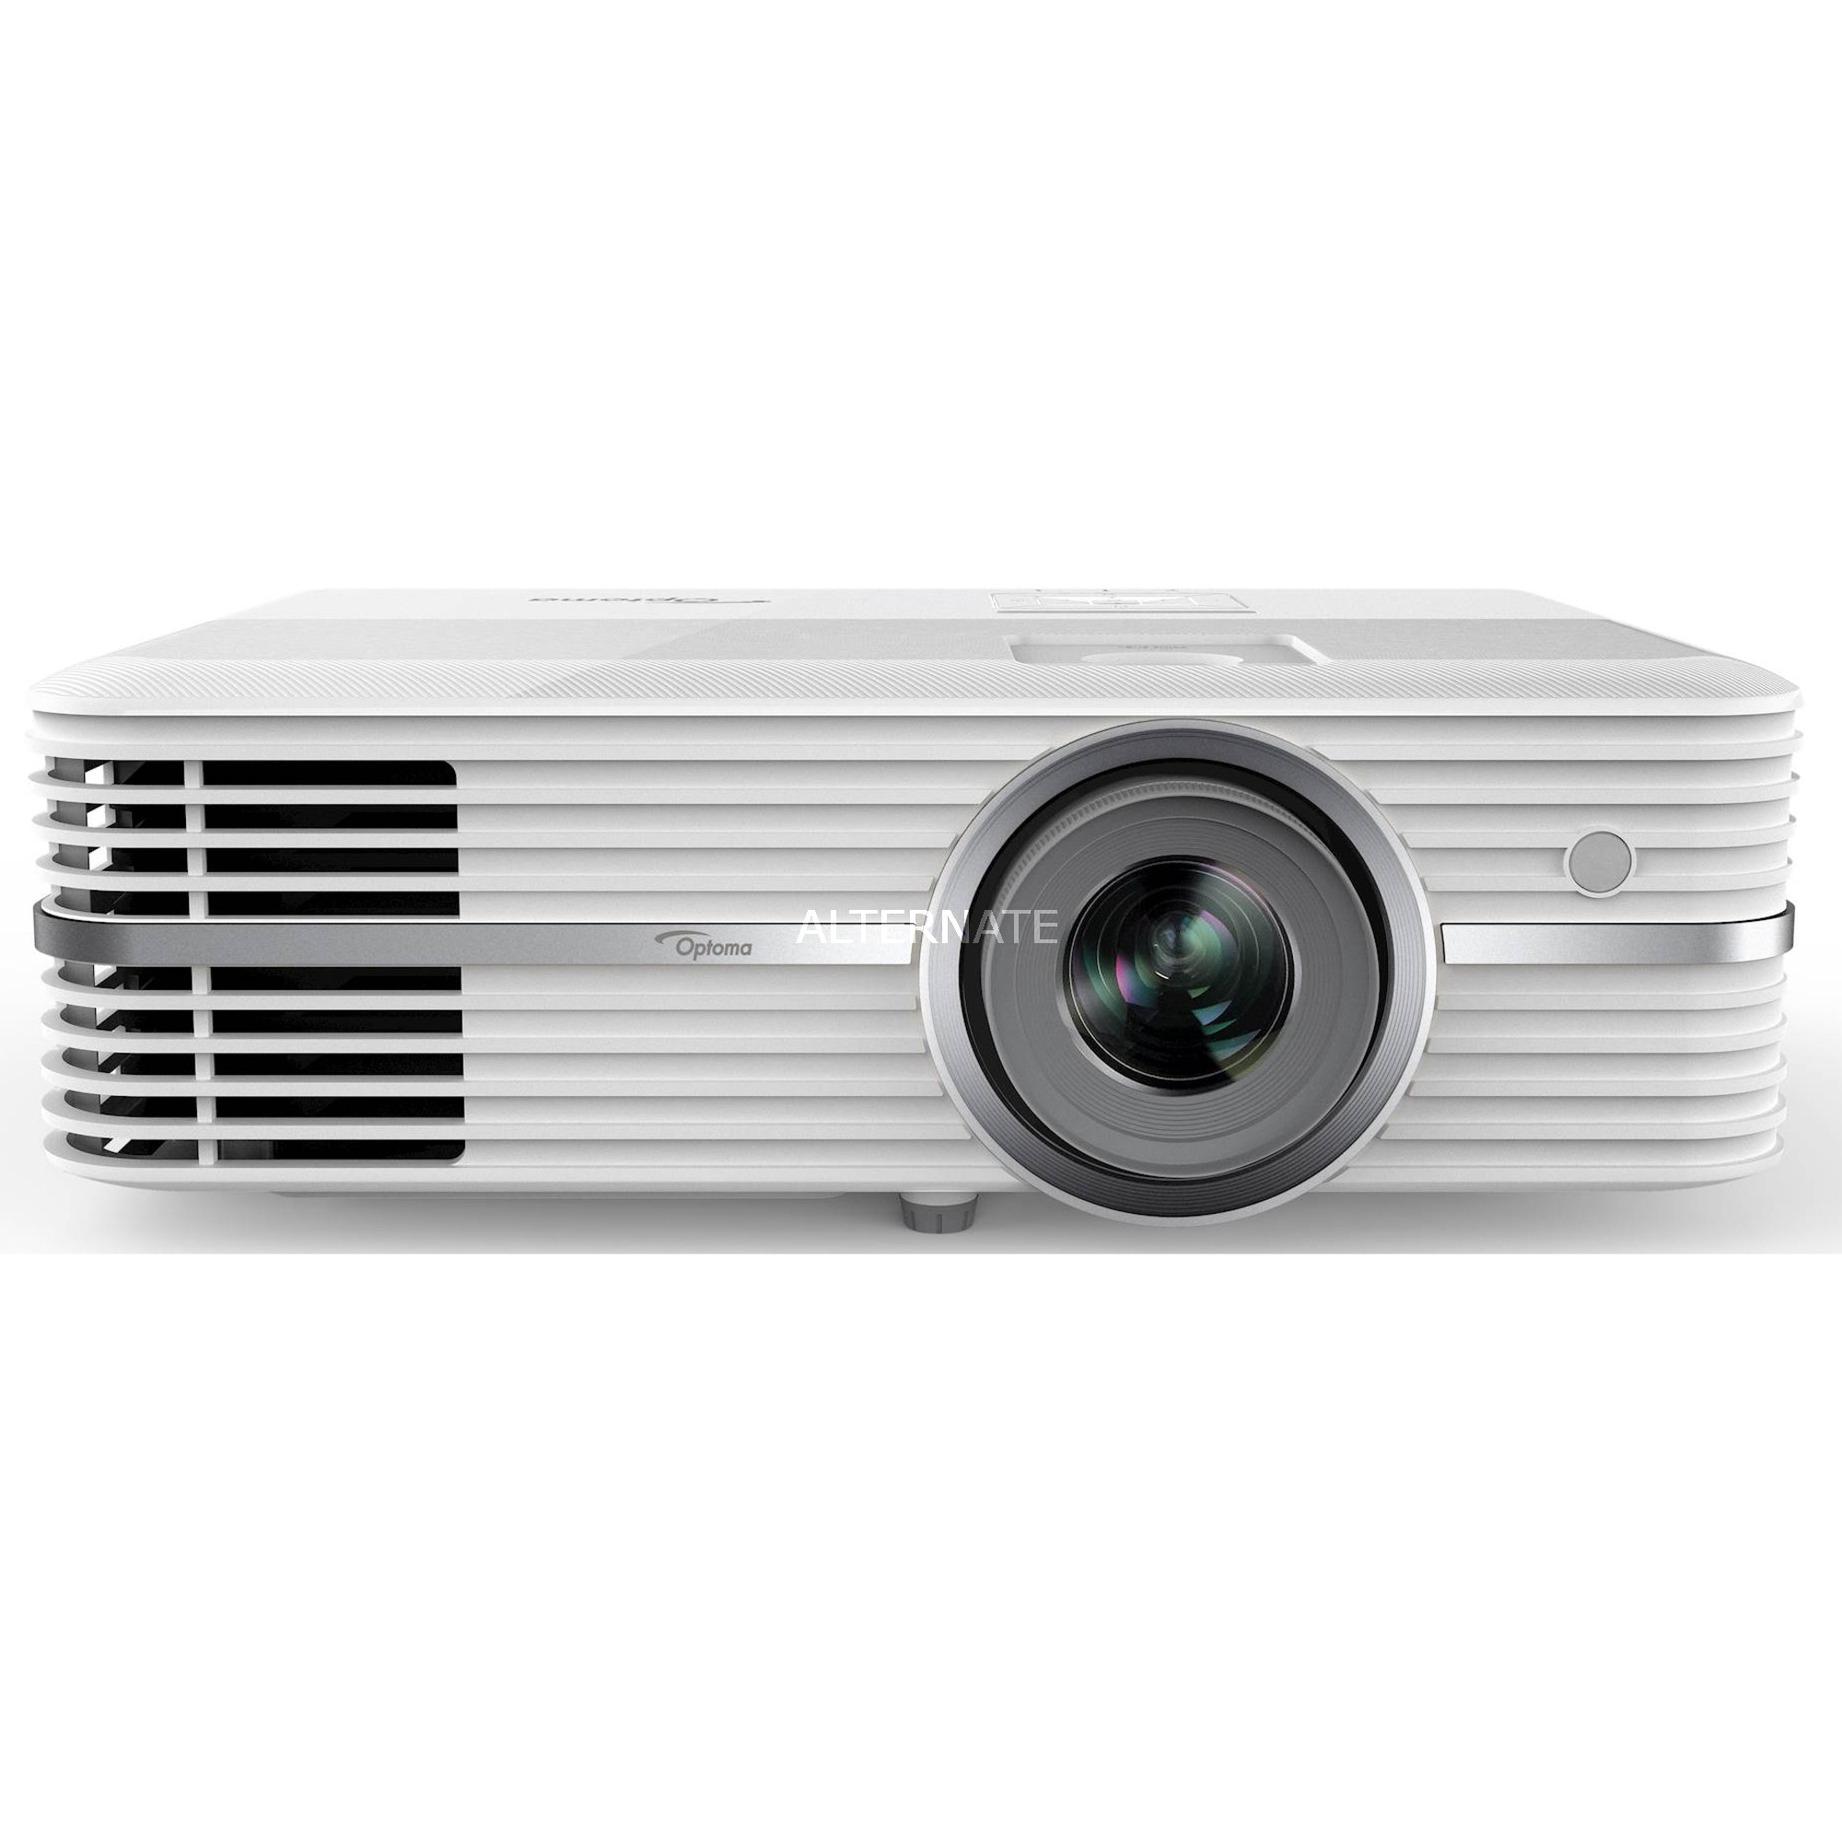 UHD300X Vidéoprojecteur portable 2200ANSI lumens DLP 2160p (3840x2160) Blanc vidéo-projecteur, Projecteur DLP